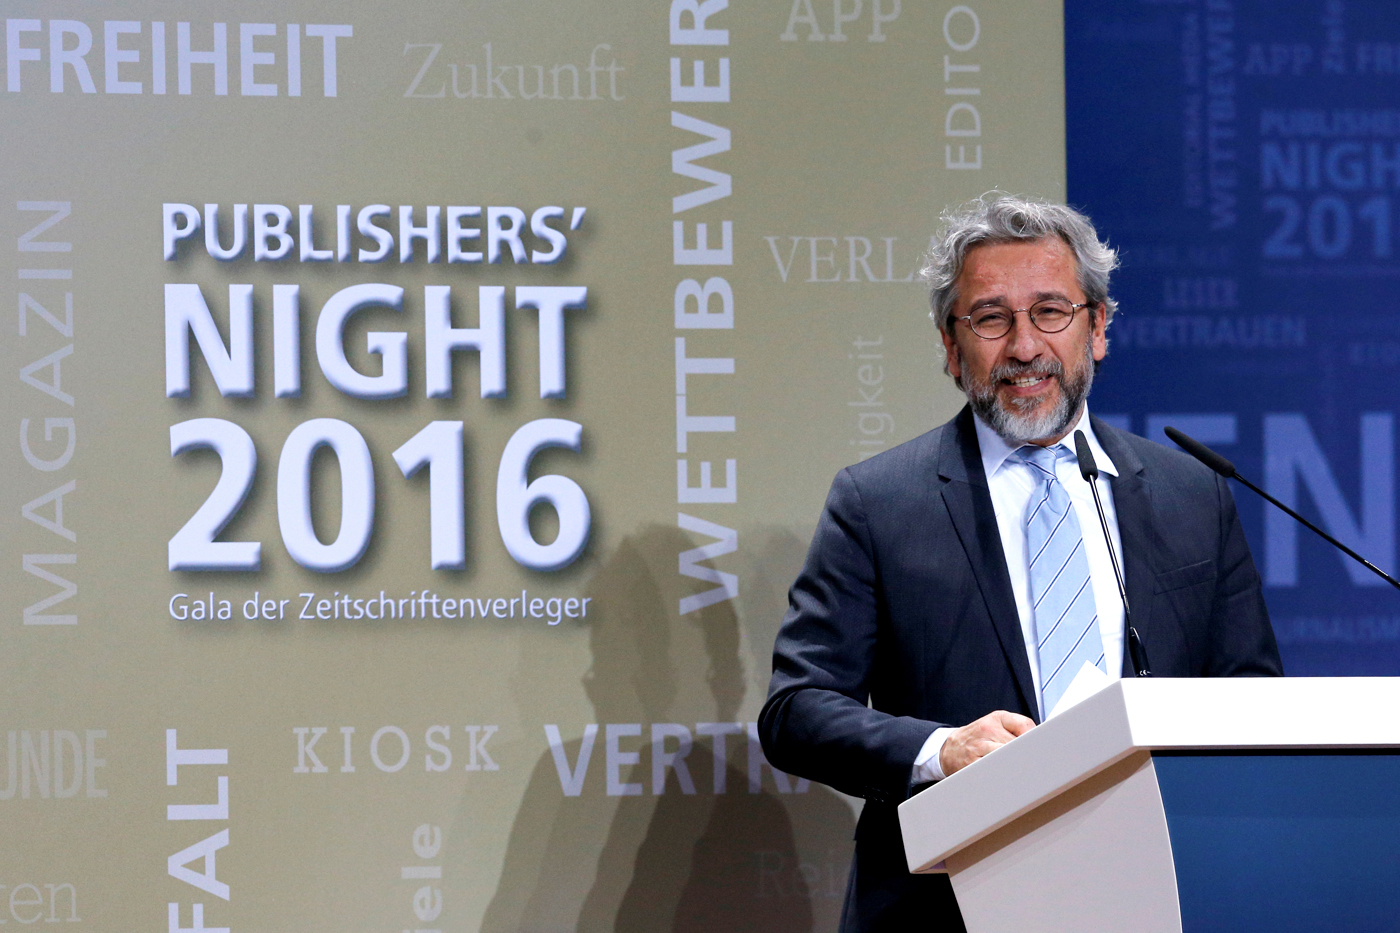 Event: VDZ Publishers' Night 2016